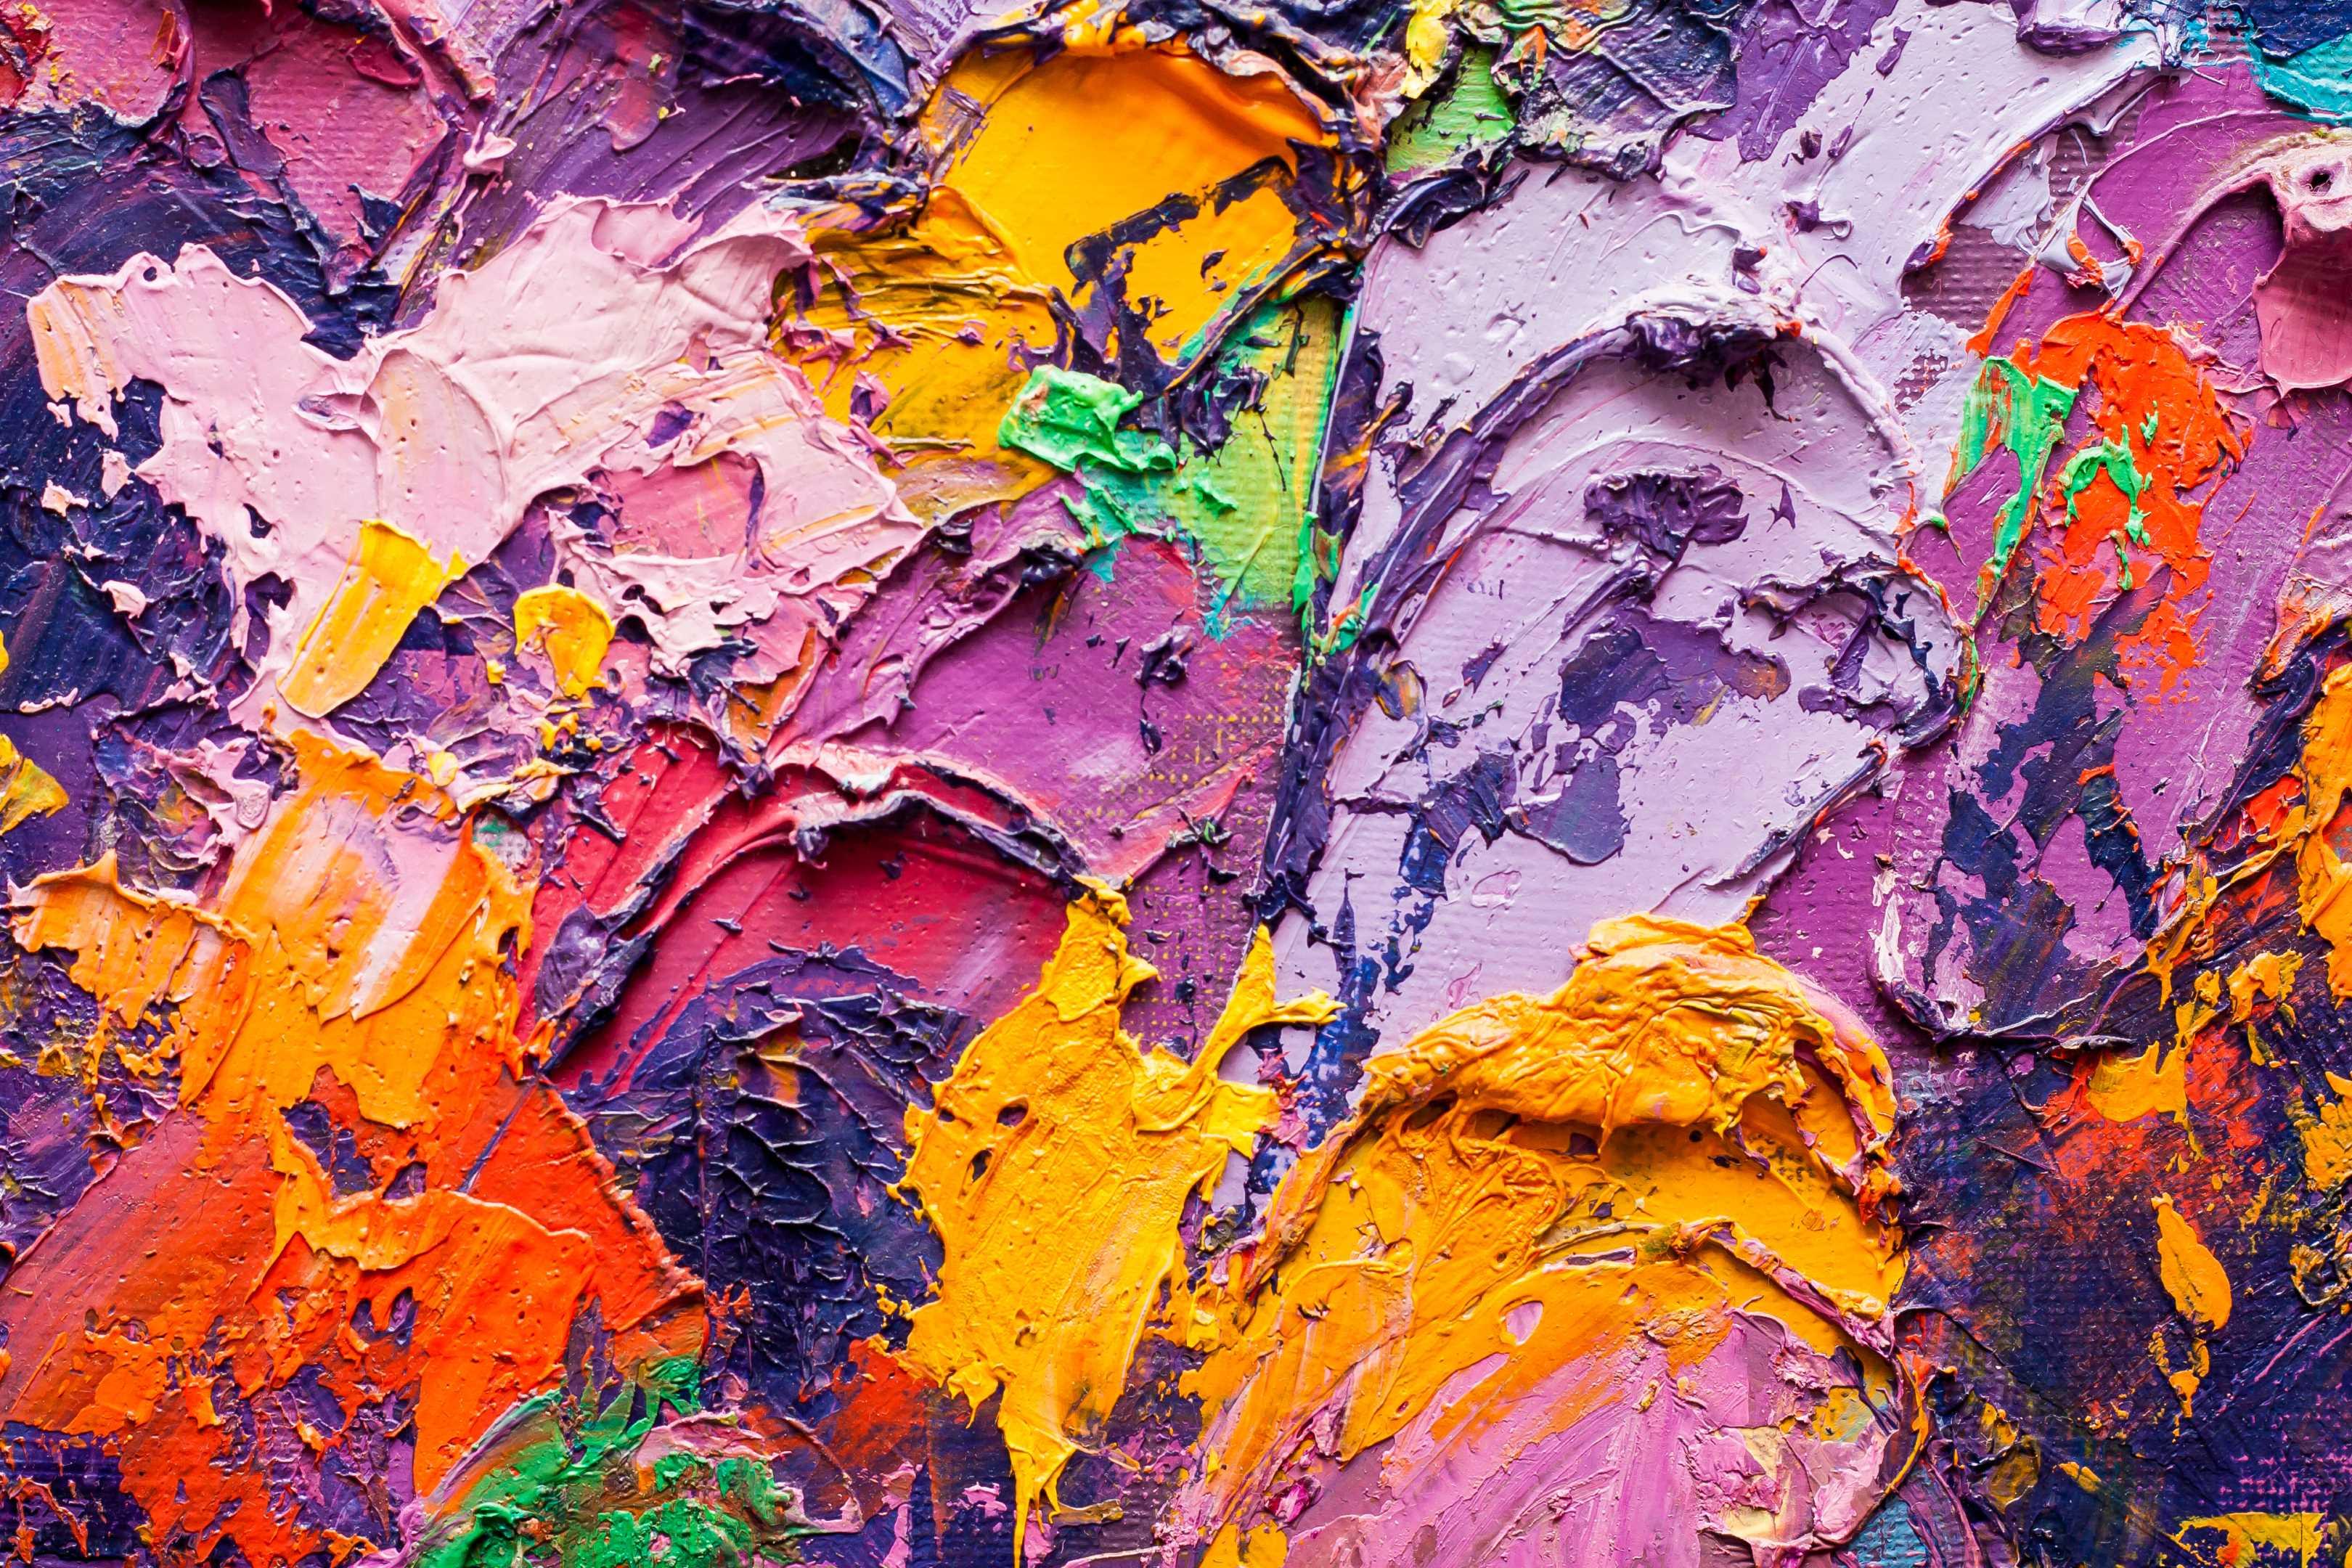 Cuadros al óleo sobre lienzo